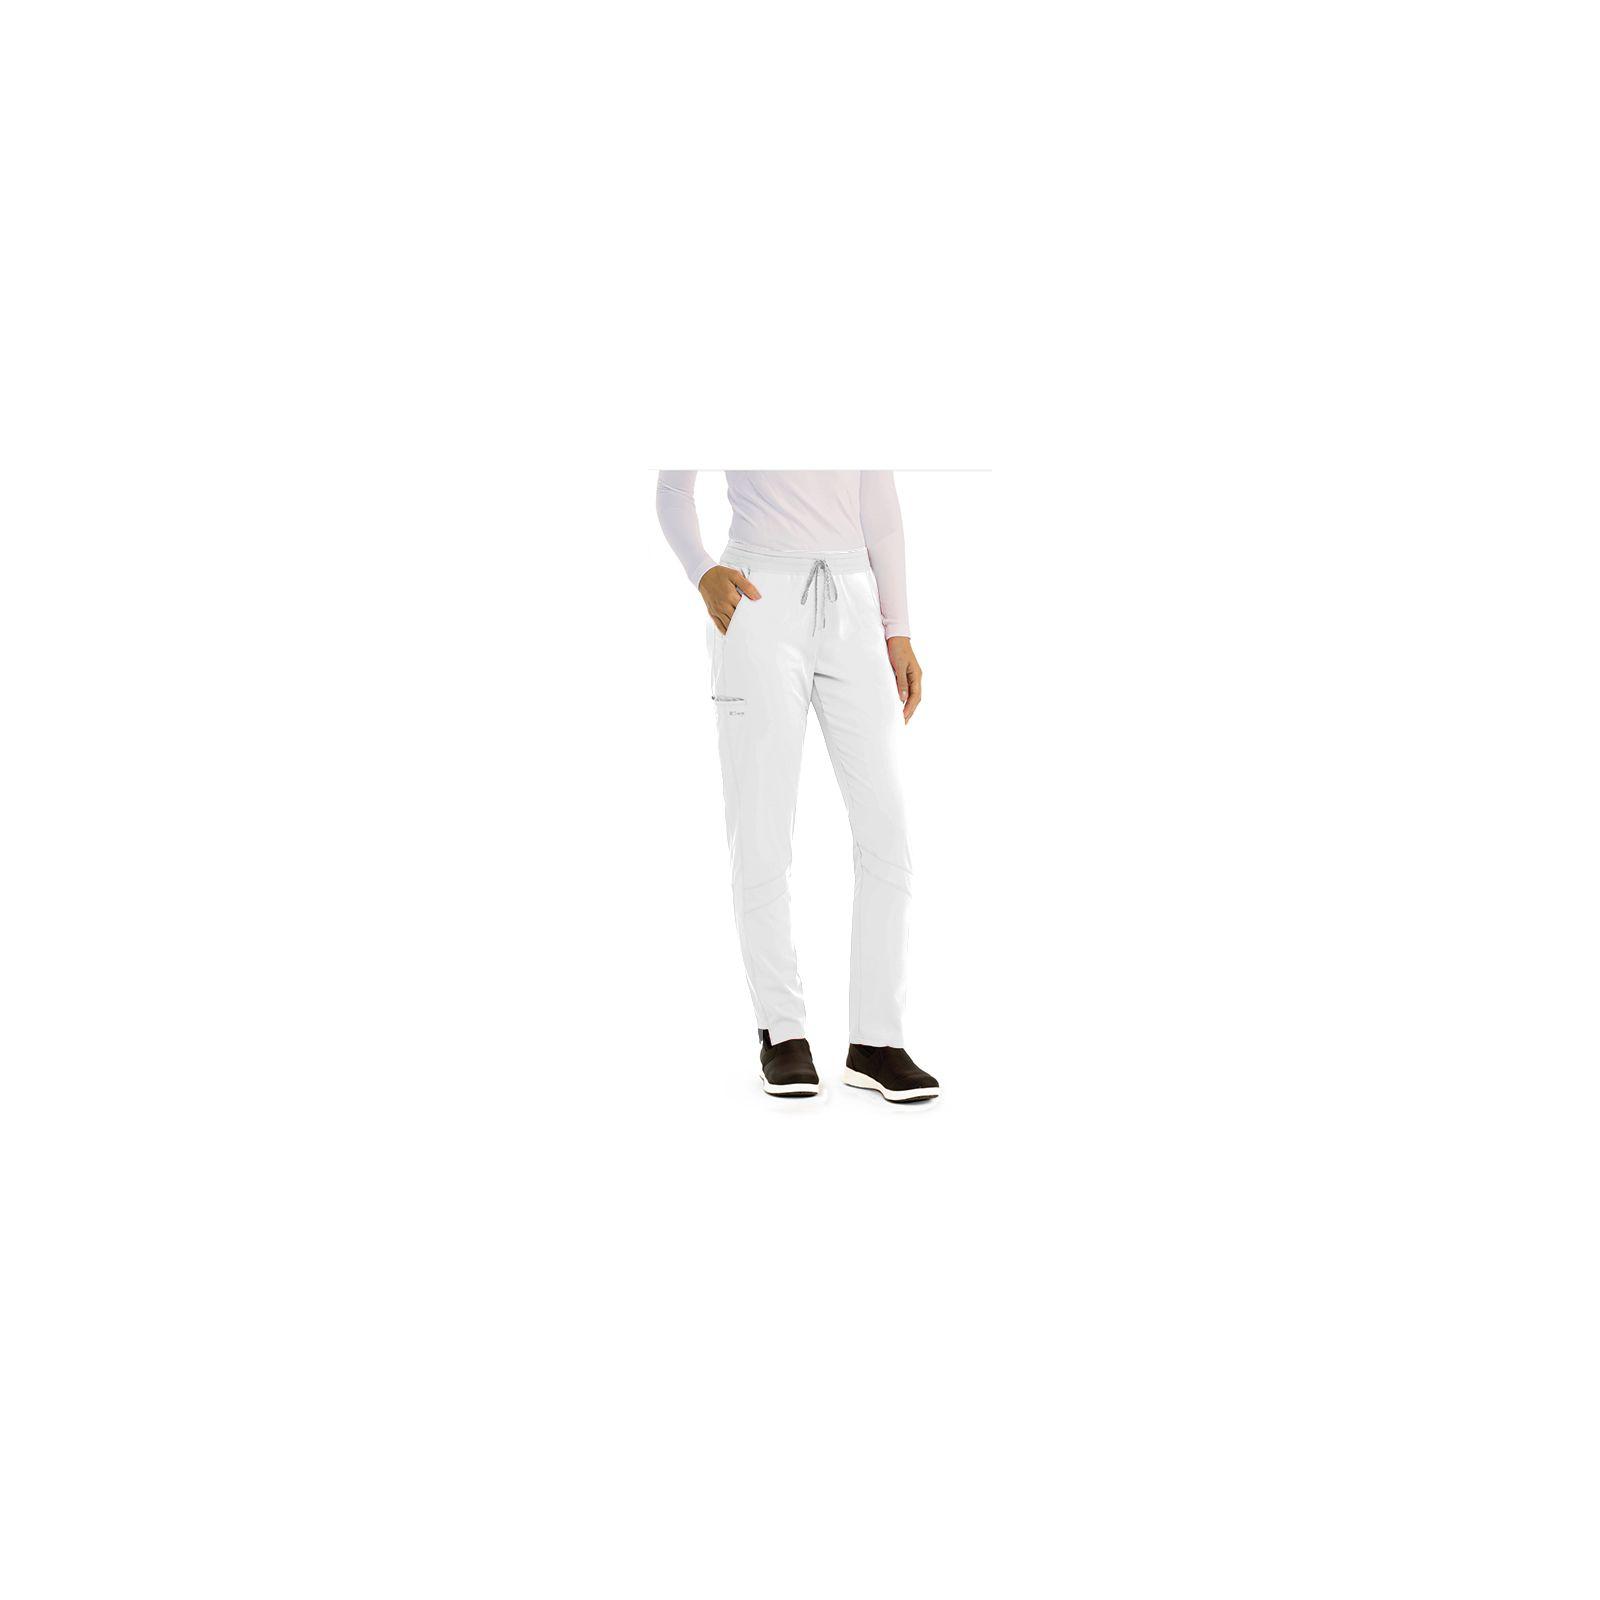 "Pantalon médical femme, collection ""Grey's Anatomy Stretch"" (GVSP509-) blanc vue coté"